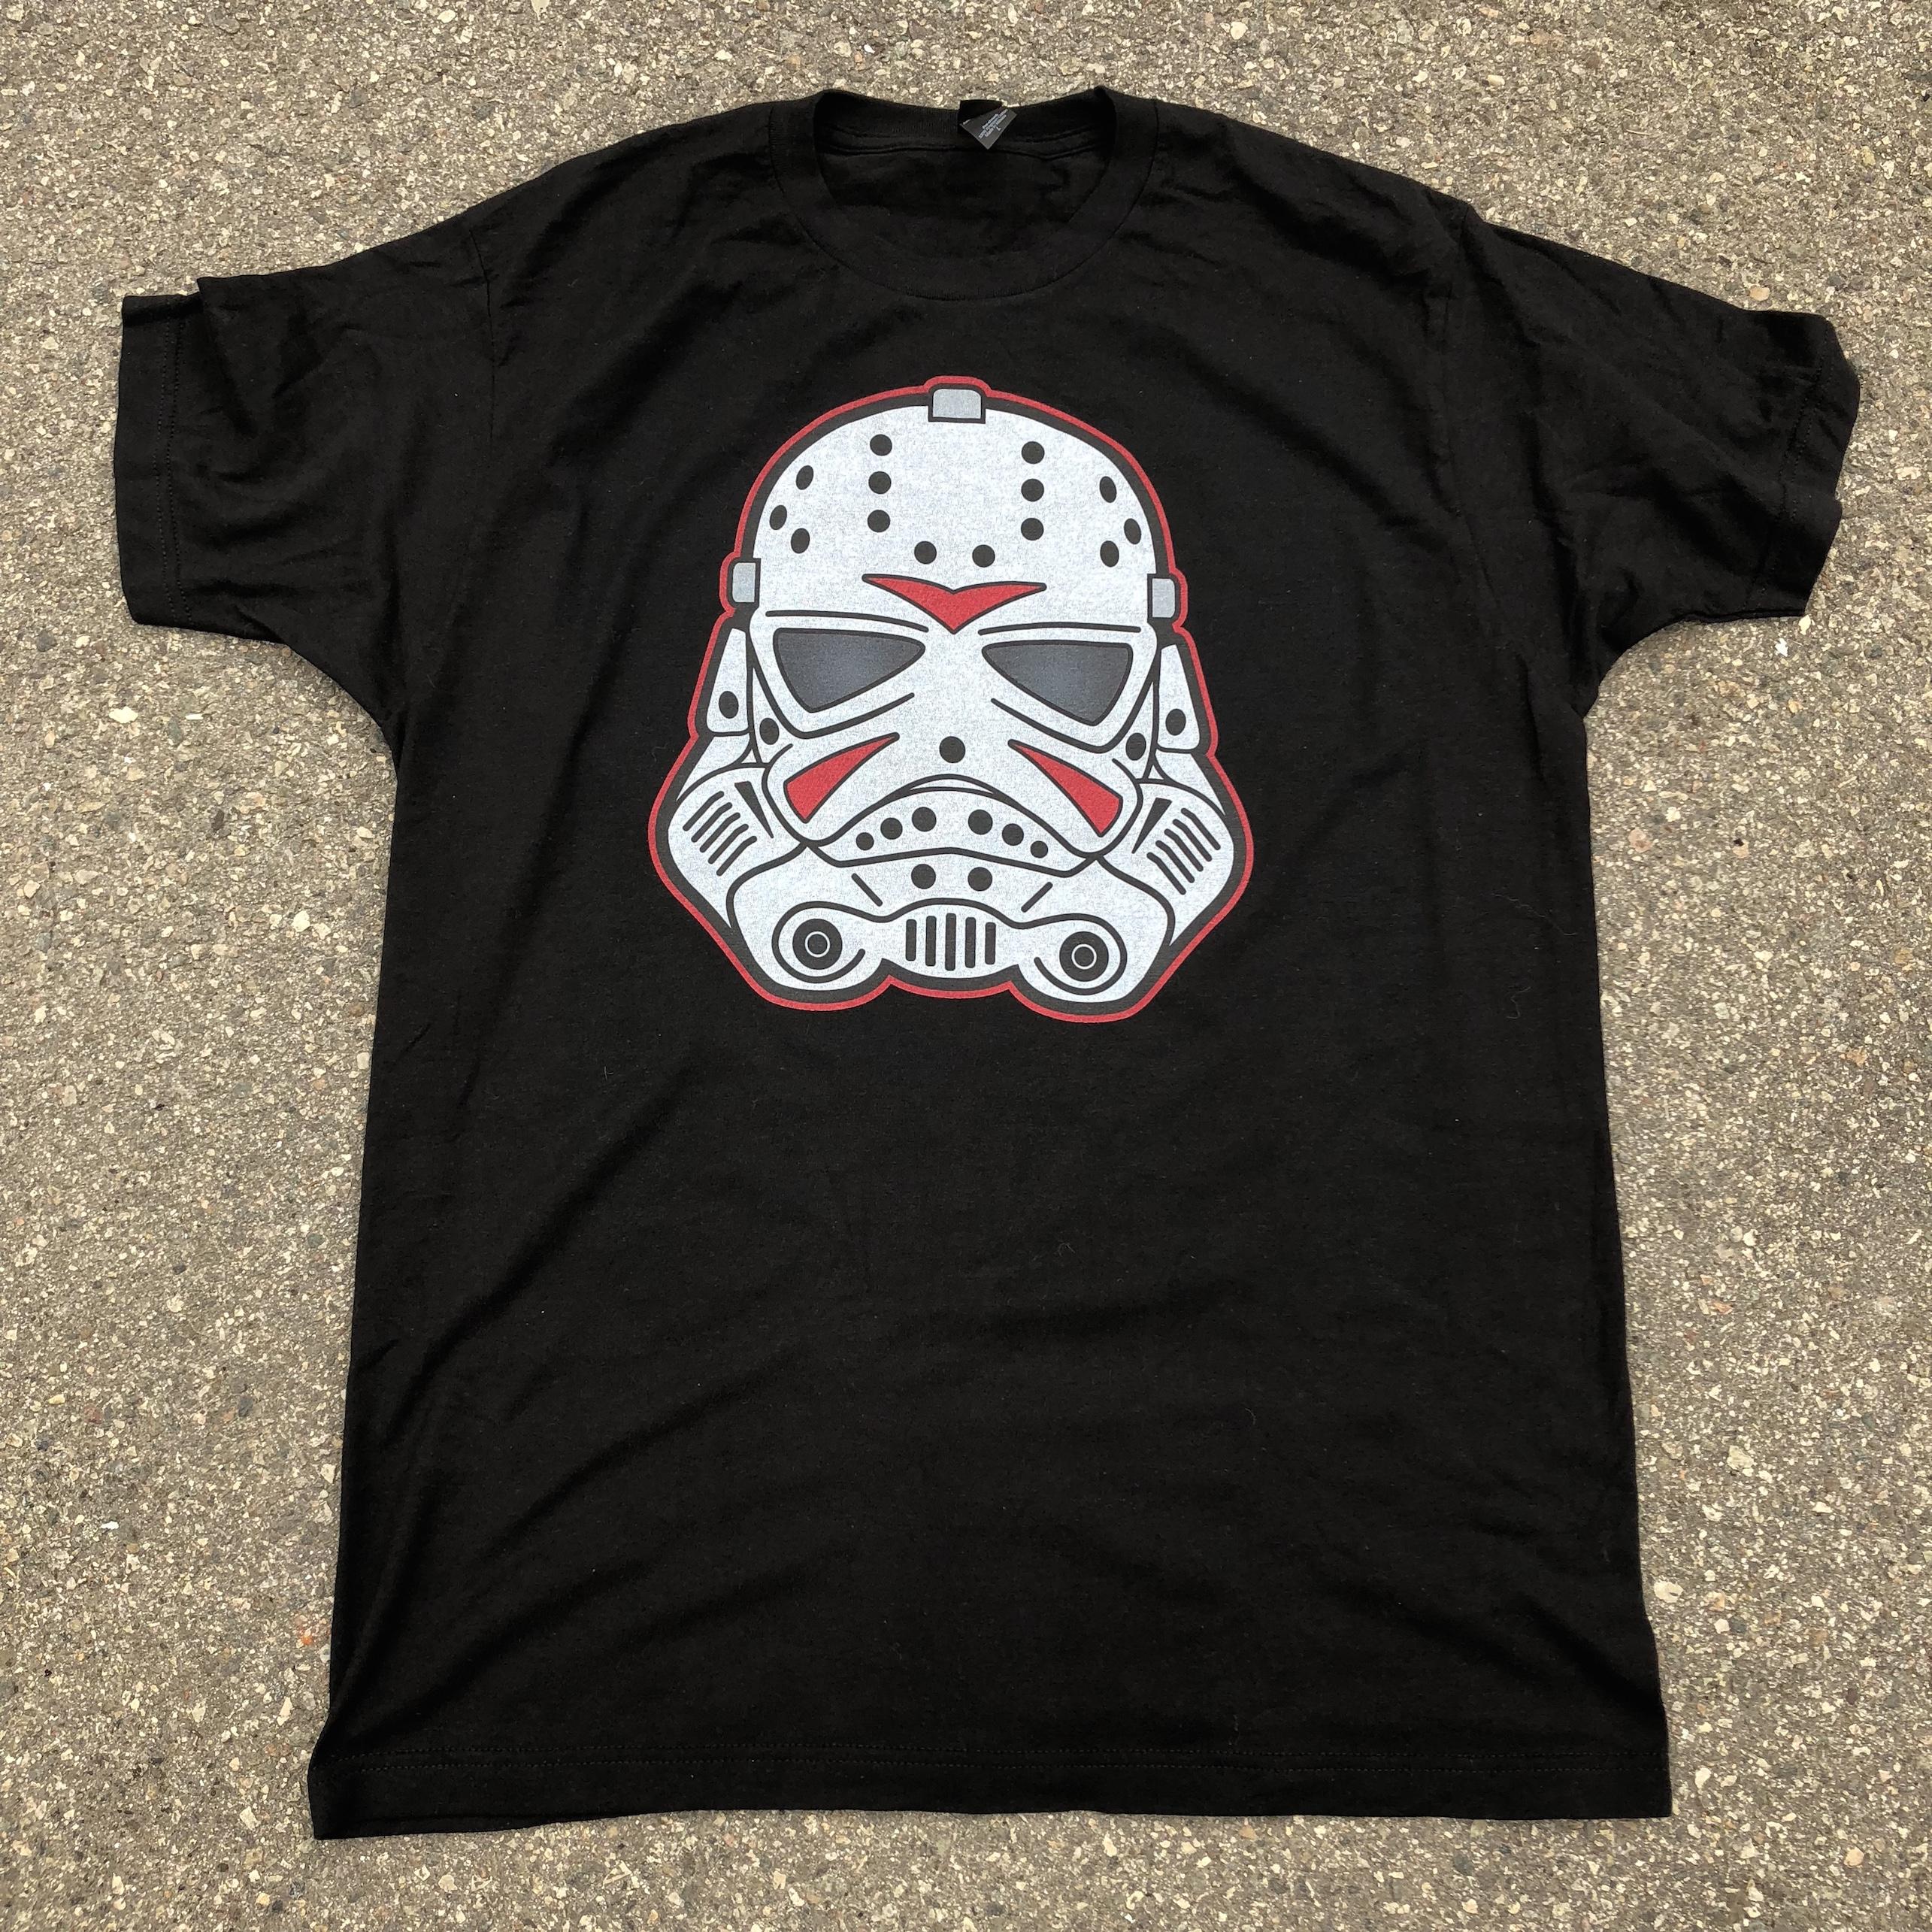 f2e53fb2 Stormtrooper Jason T-Shirt (Black) · BB-CRE.8 · Online Store Powered ...